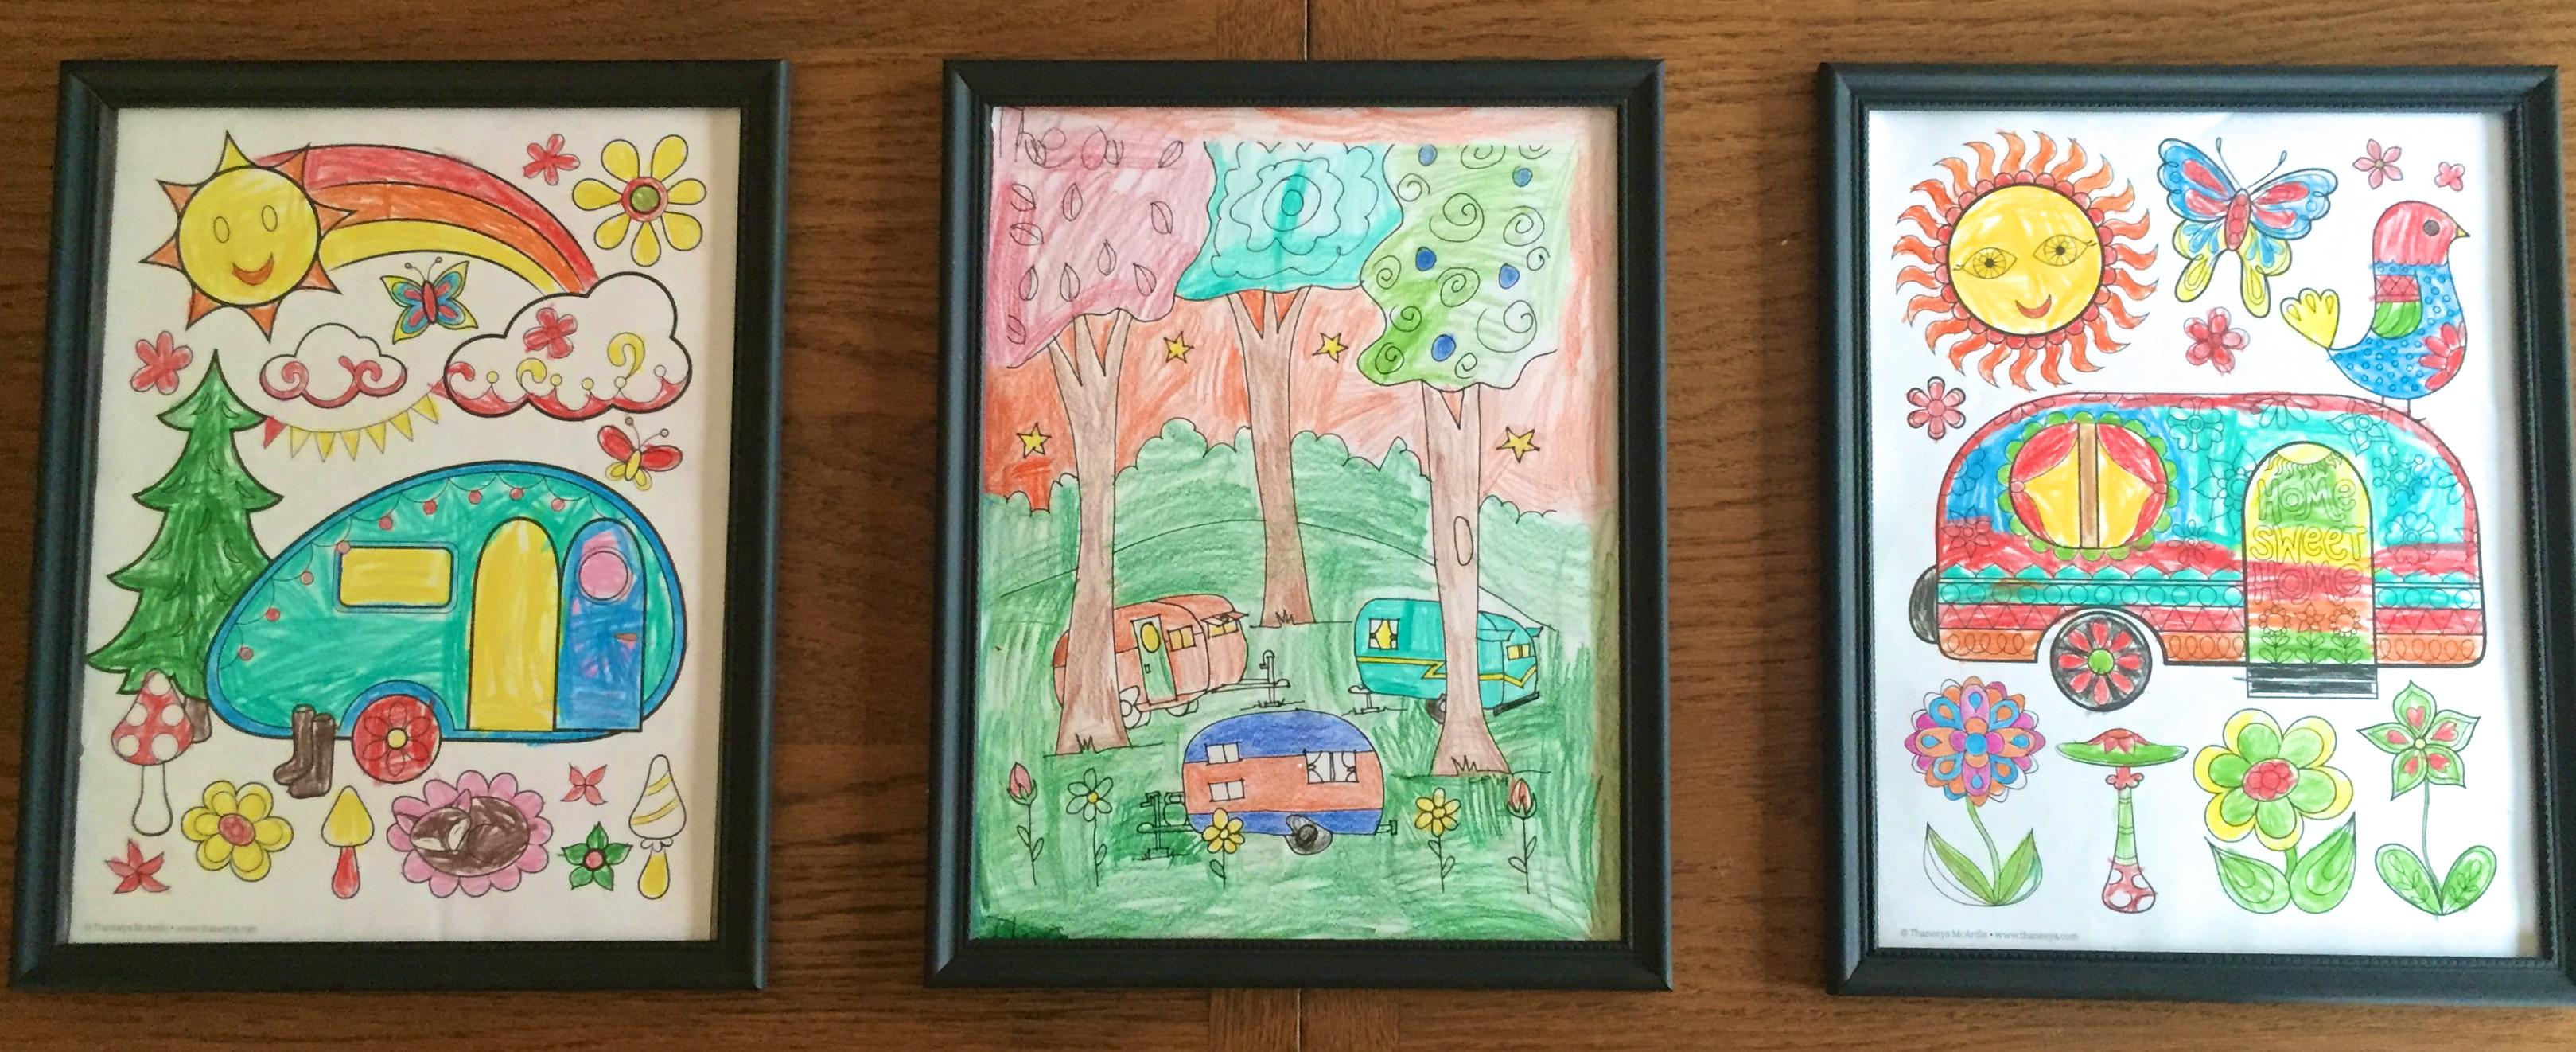 camper coloring